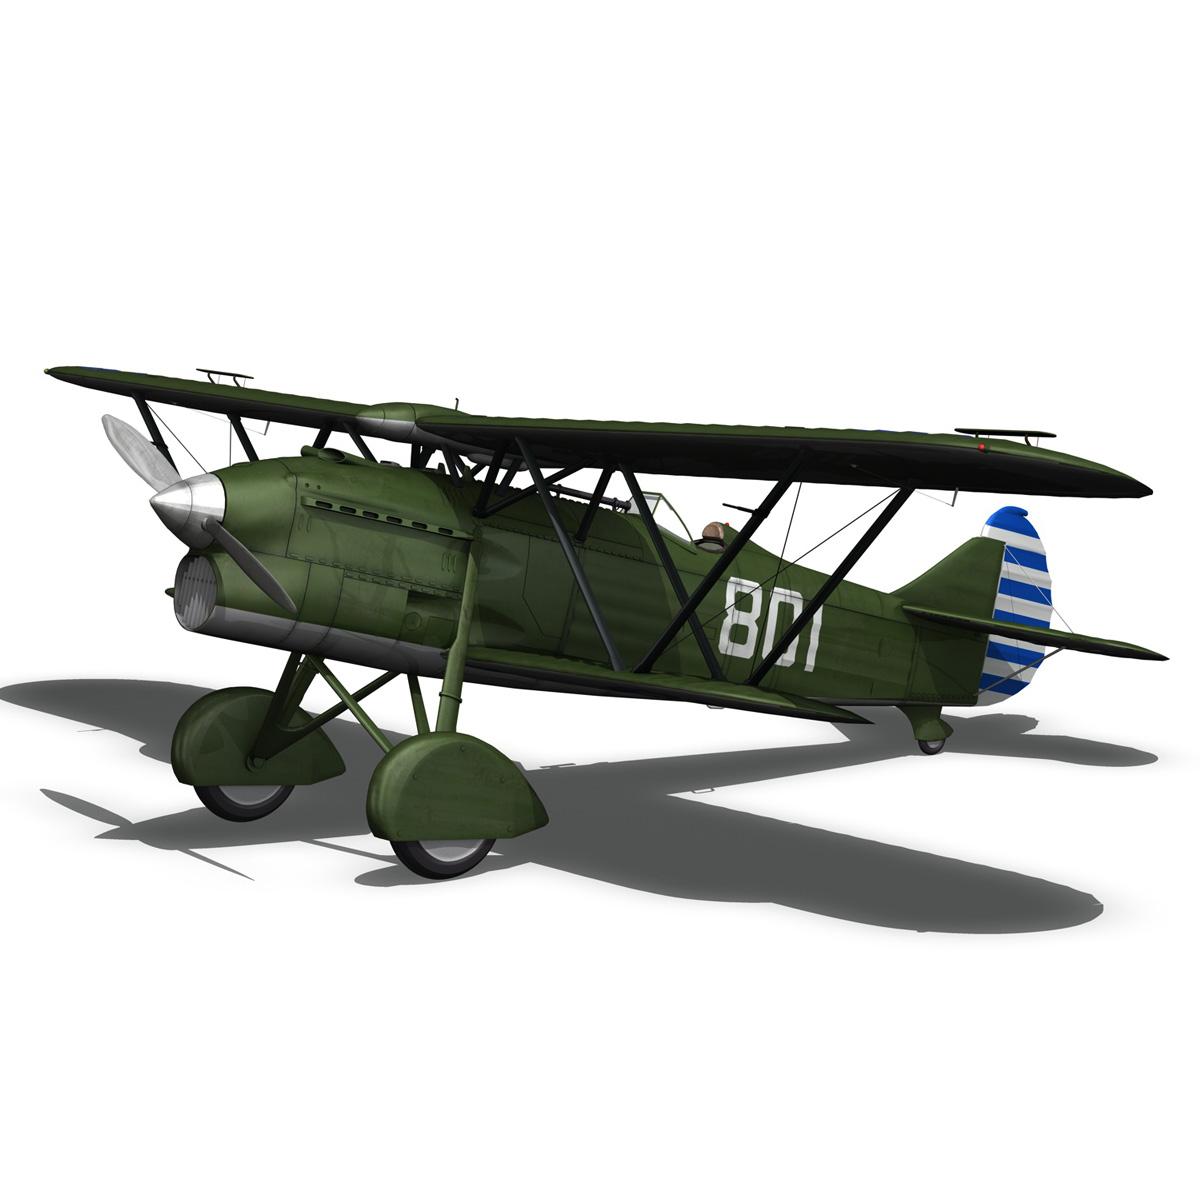 fiat cr.32 – chinese nationalist air force 3d model fbx c4d lwo obj 272635